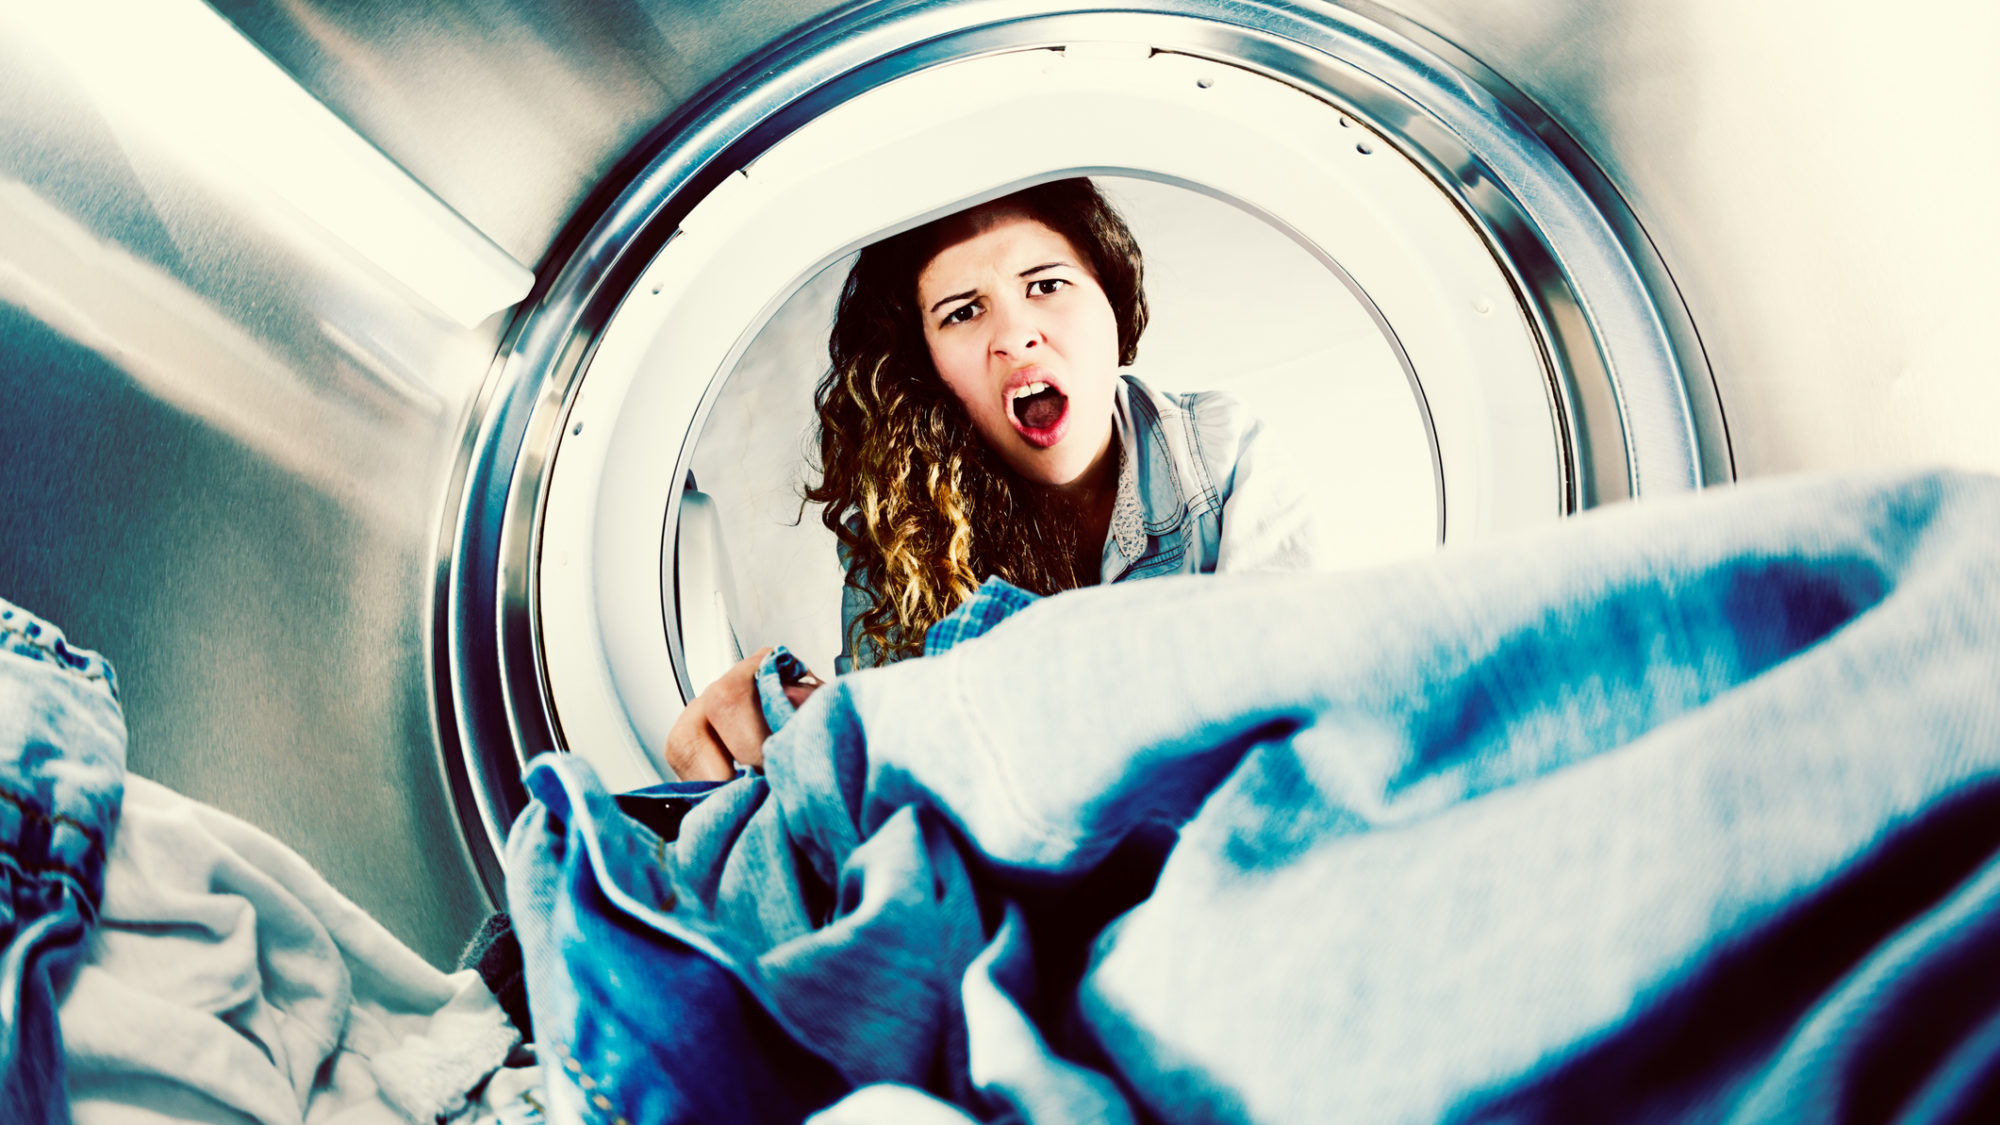 Grandes eletrodomésticos, quando trocar?